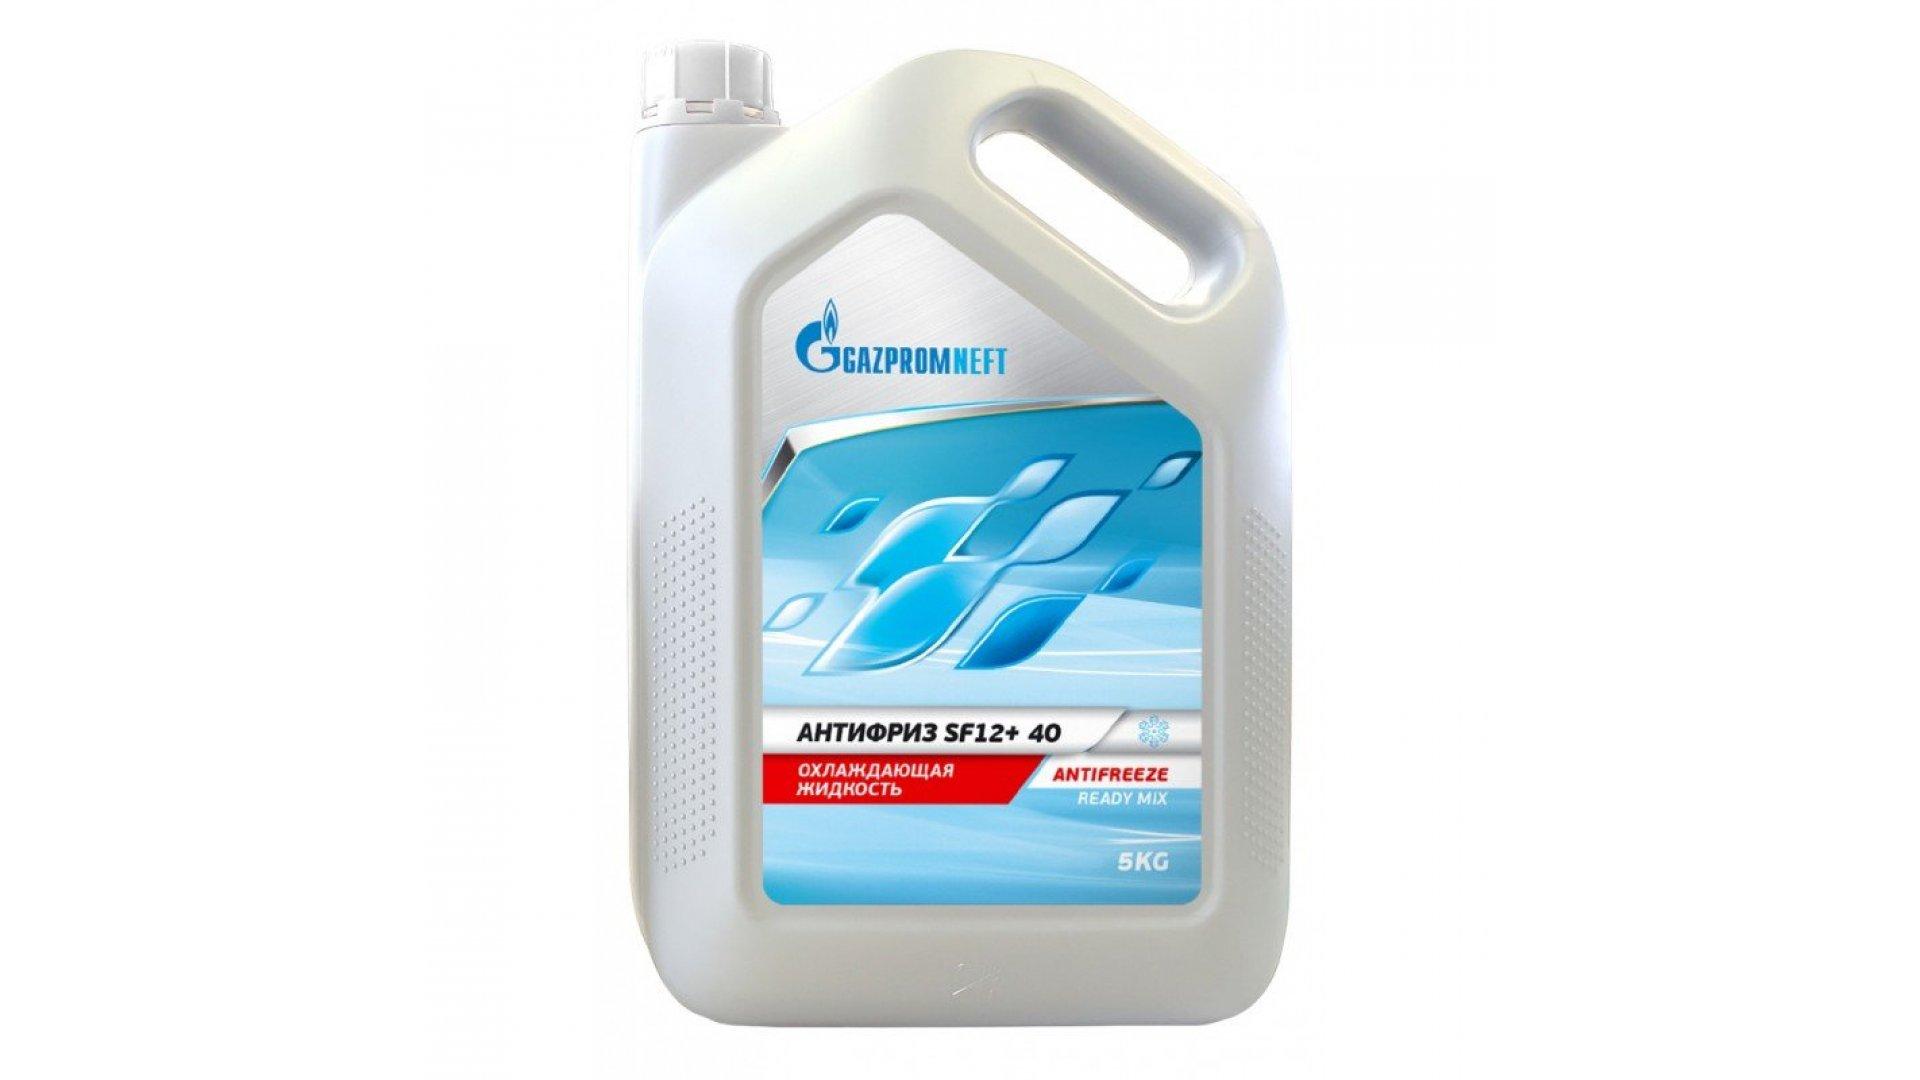 GAZPROM Antifreeze SF12+ 40 (G12+) 5L